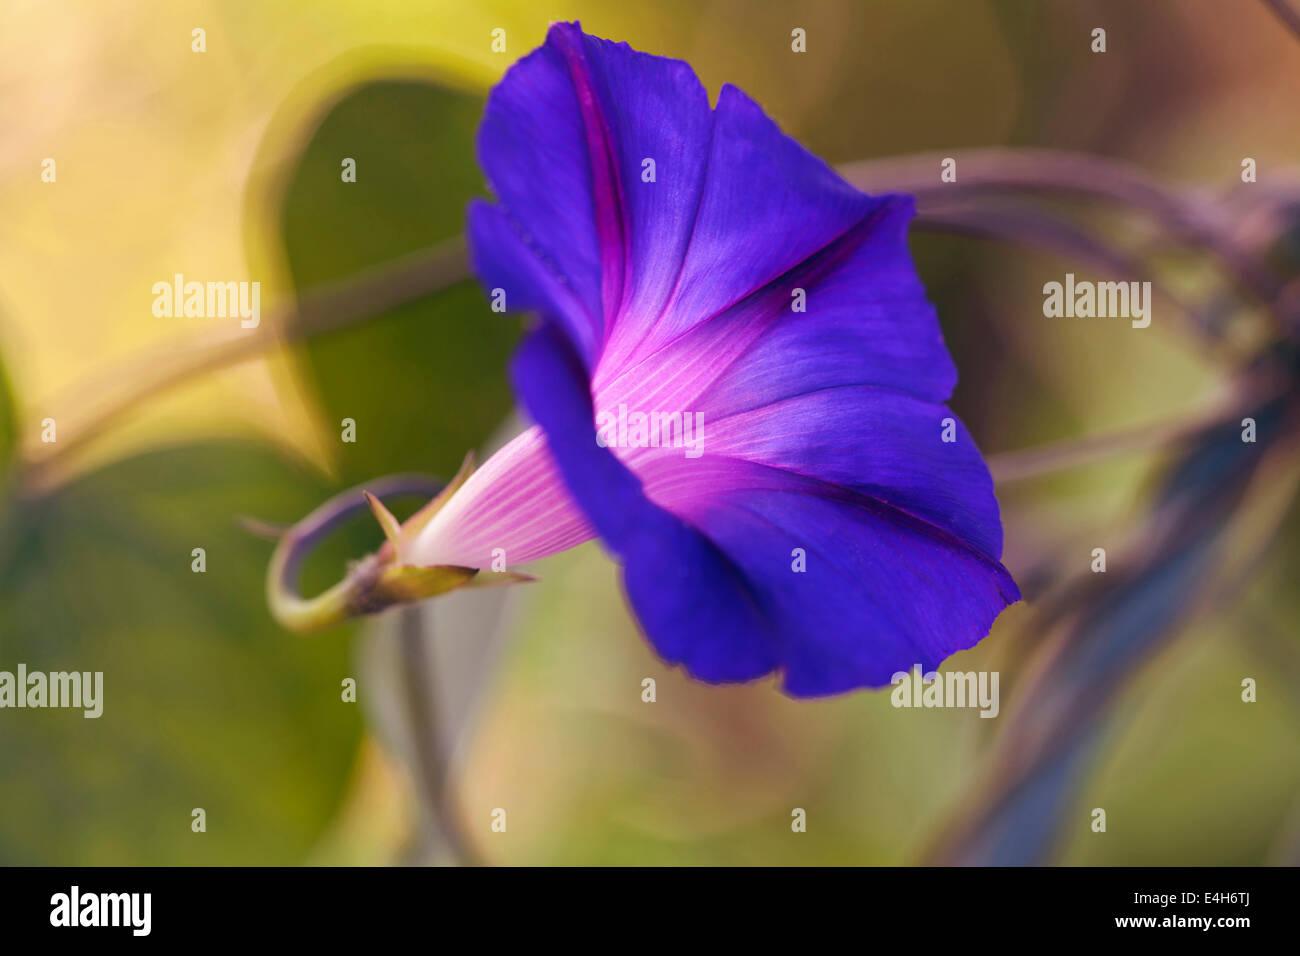 Morning glory – Purple morning glory, Ipomoea purpurea 'Feringa'. - Stock Image